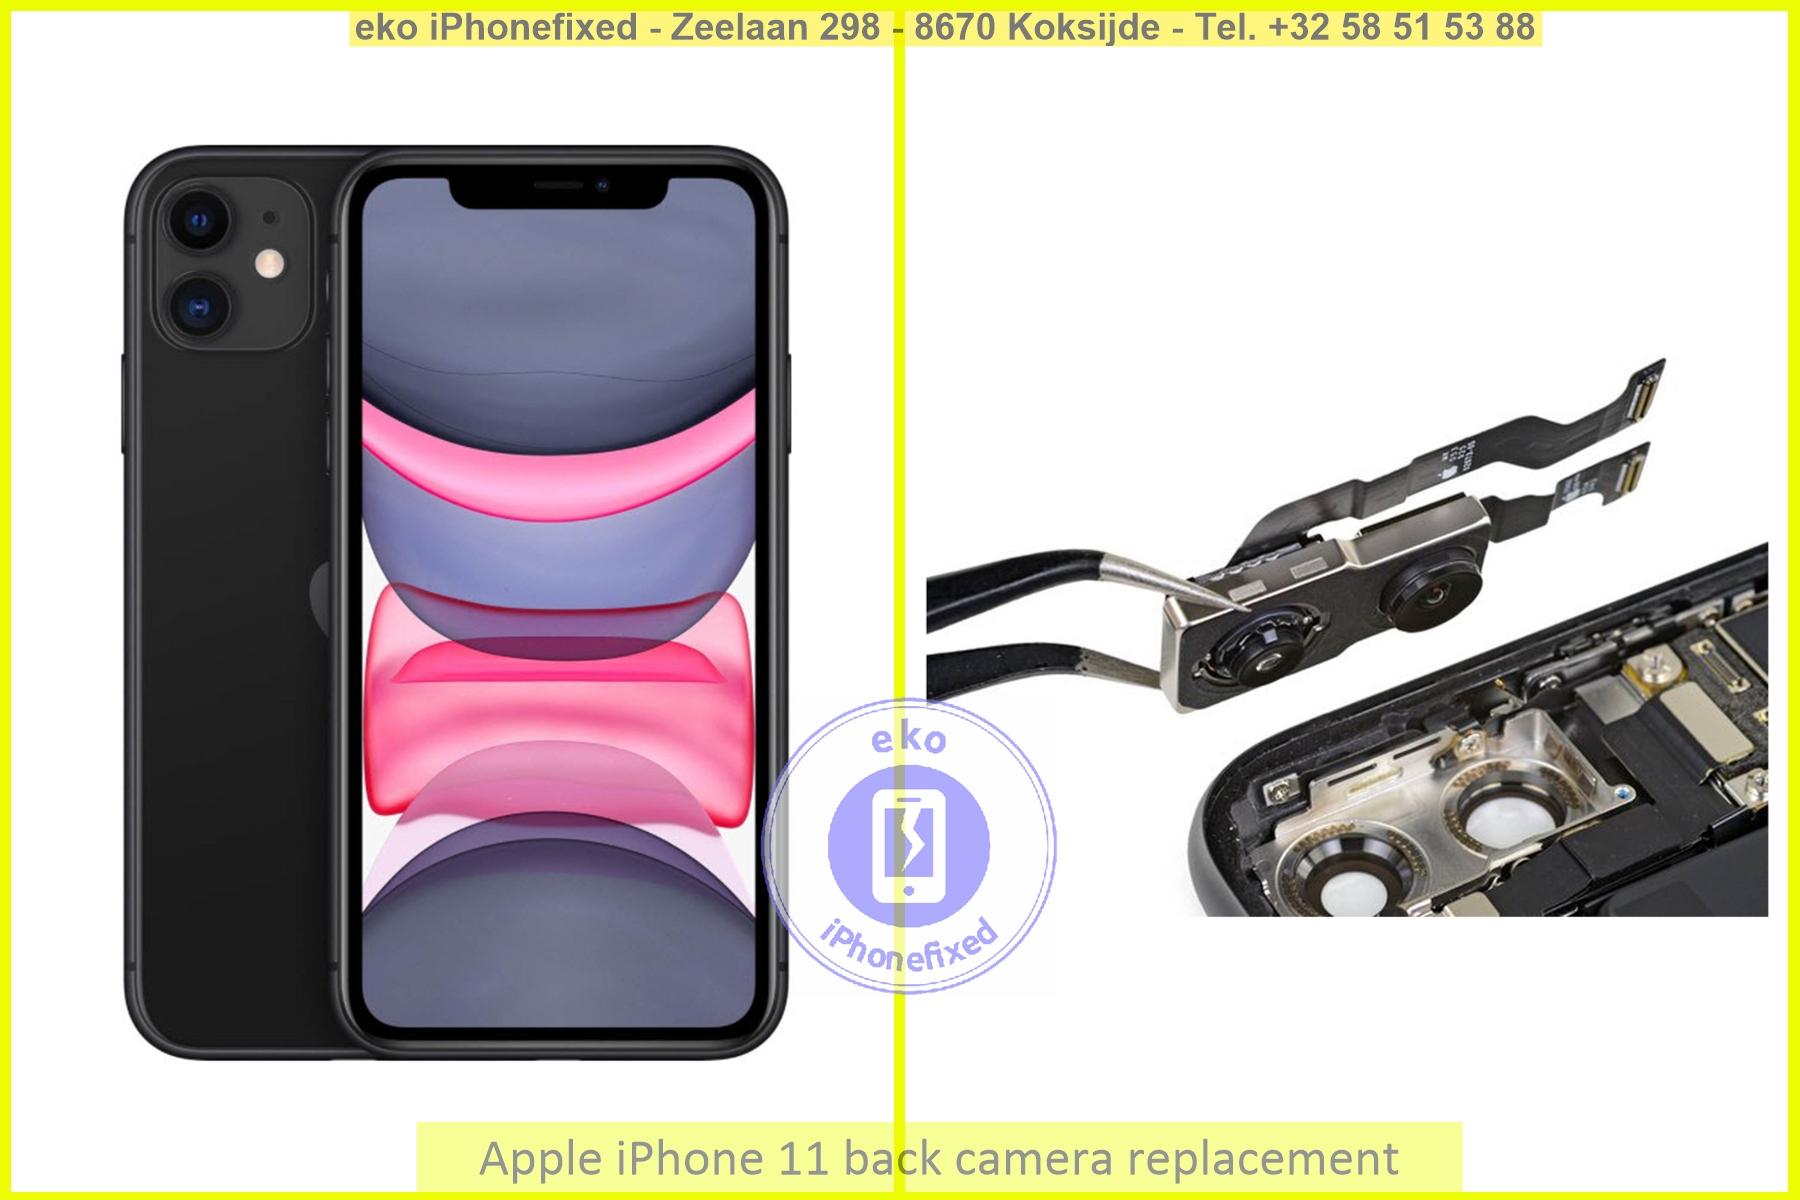 Apple iPhone 11 achterkant camera vervanging eko iPhonefixed_1